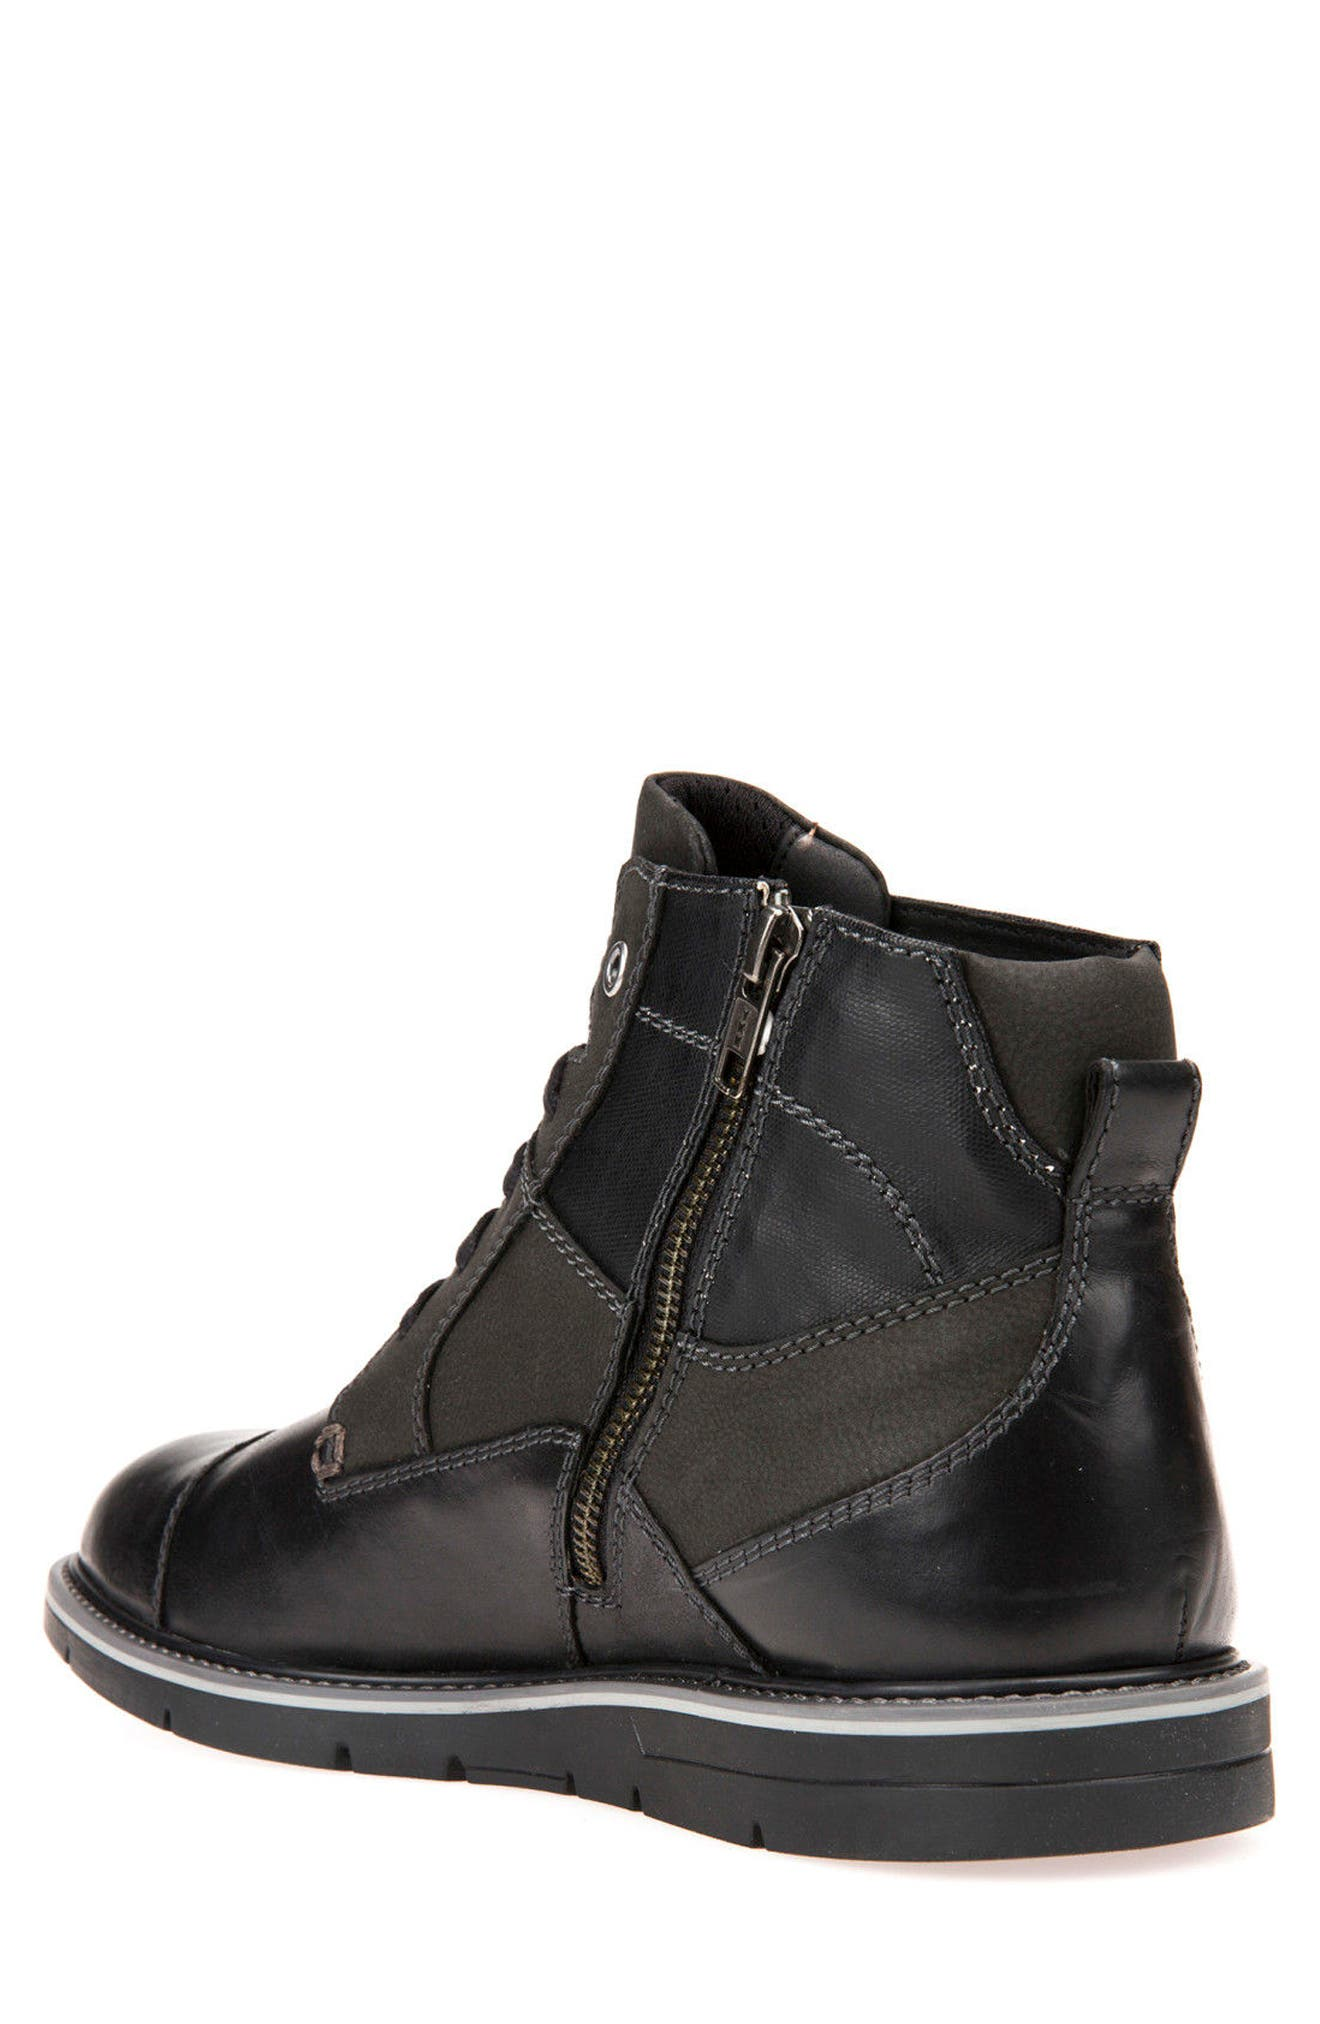 Alternate Image 2  - Geox Muvet 5 Cap Toe Boot (men)